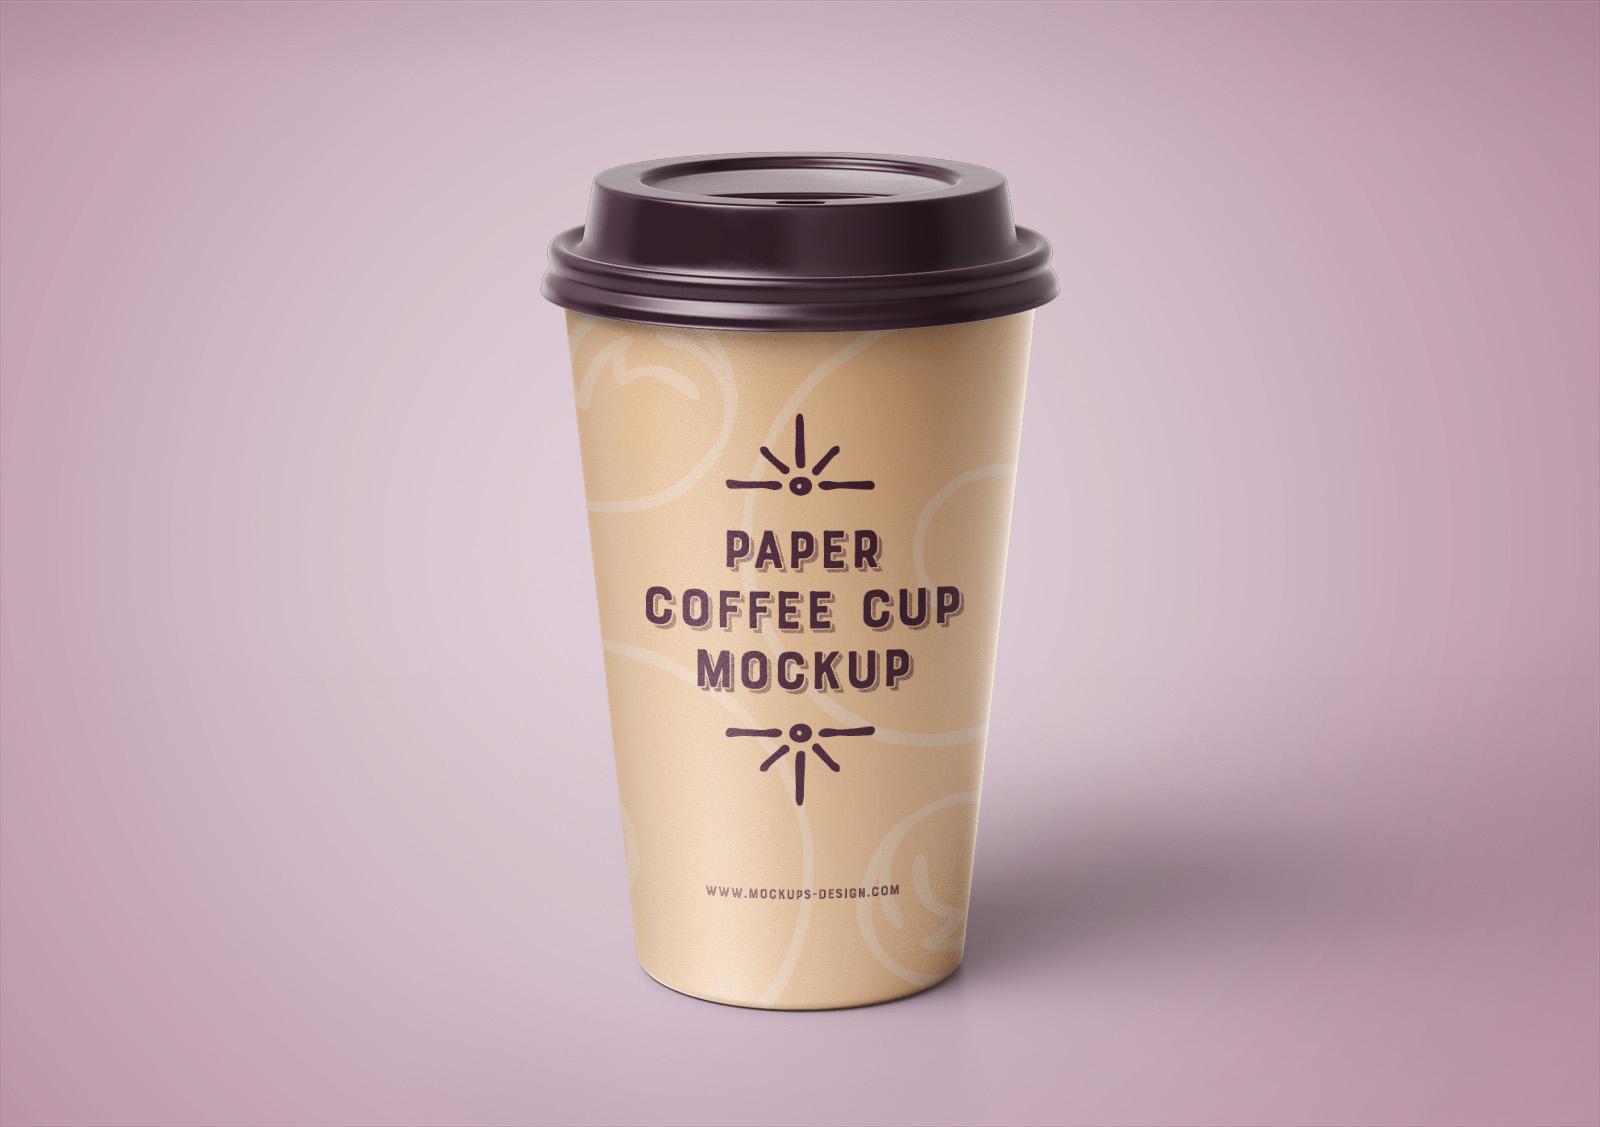 Premium Paper Coffee Cup Mockup PSD Set